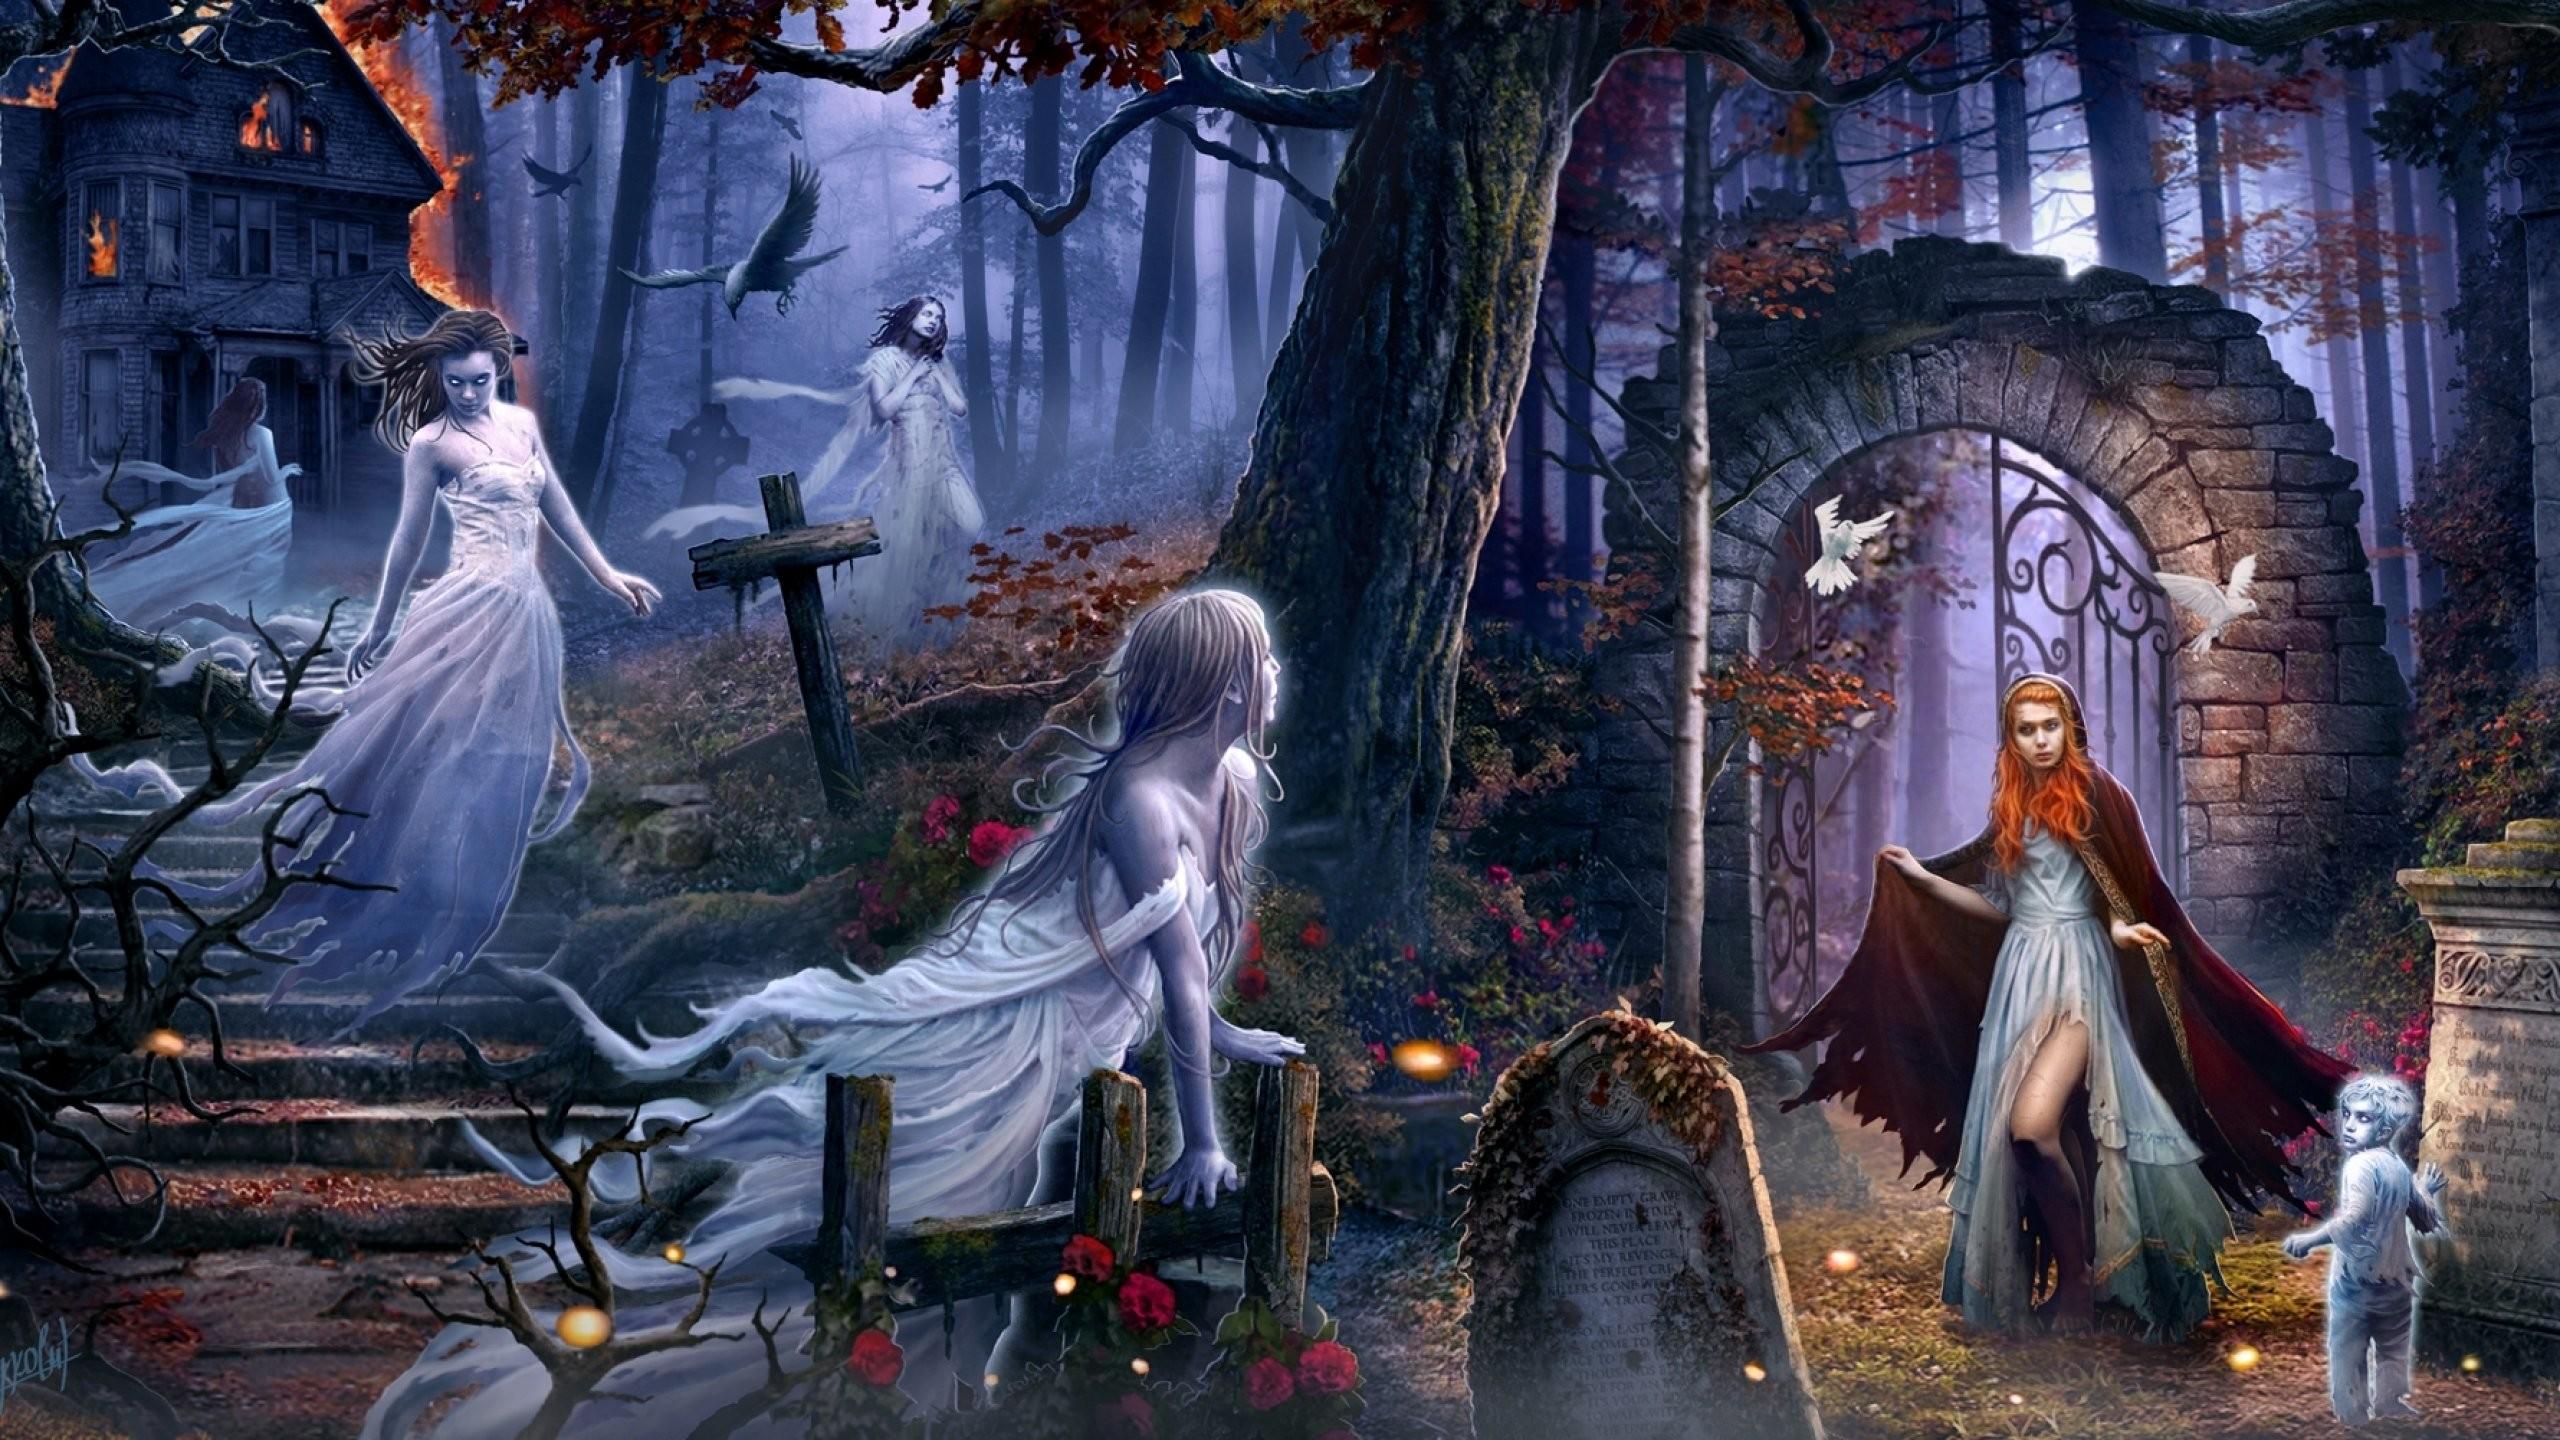 Dark Ghost Fantasy Art Artwork Horror Spooky Creepy Halloween … Dark  Ghost Fantasy Art Artwork Horror Spooky Creepy Halloween